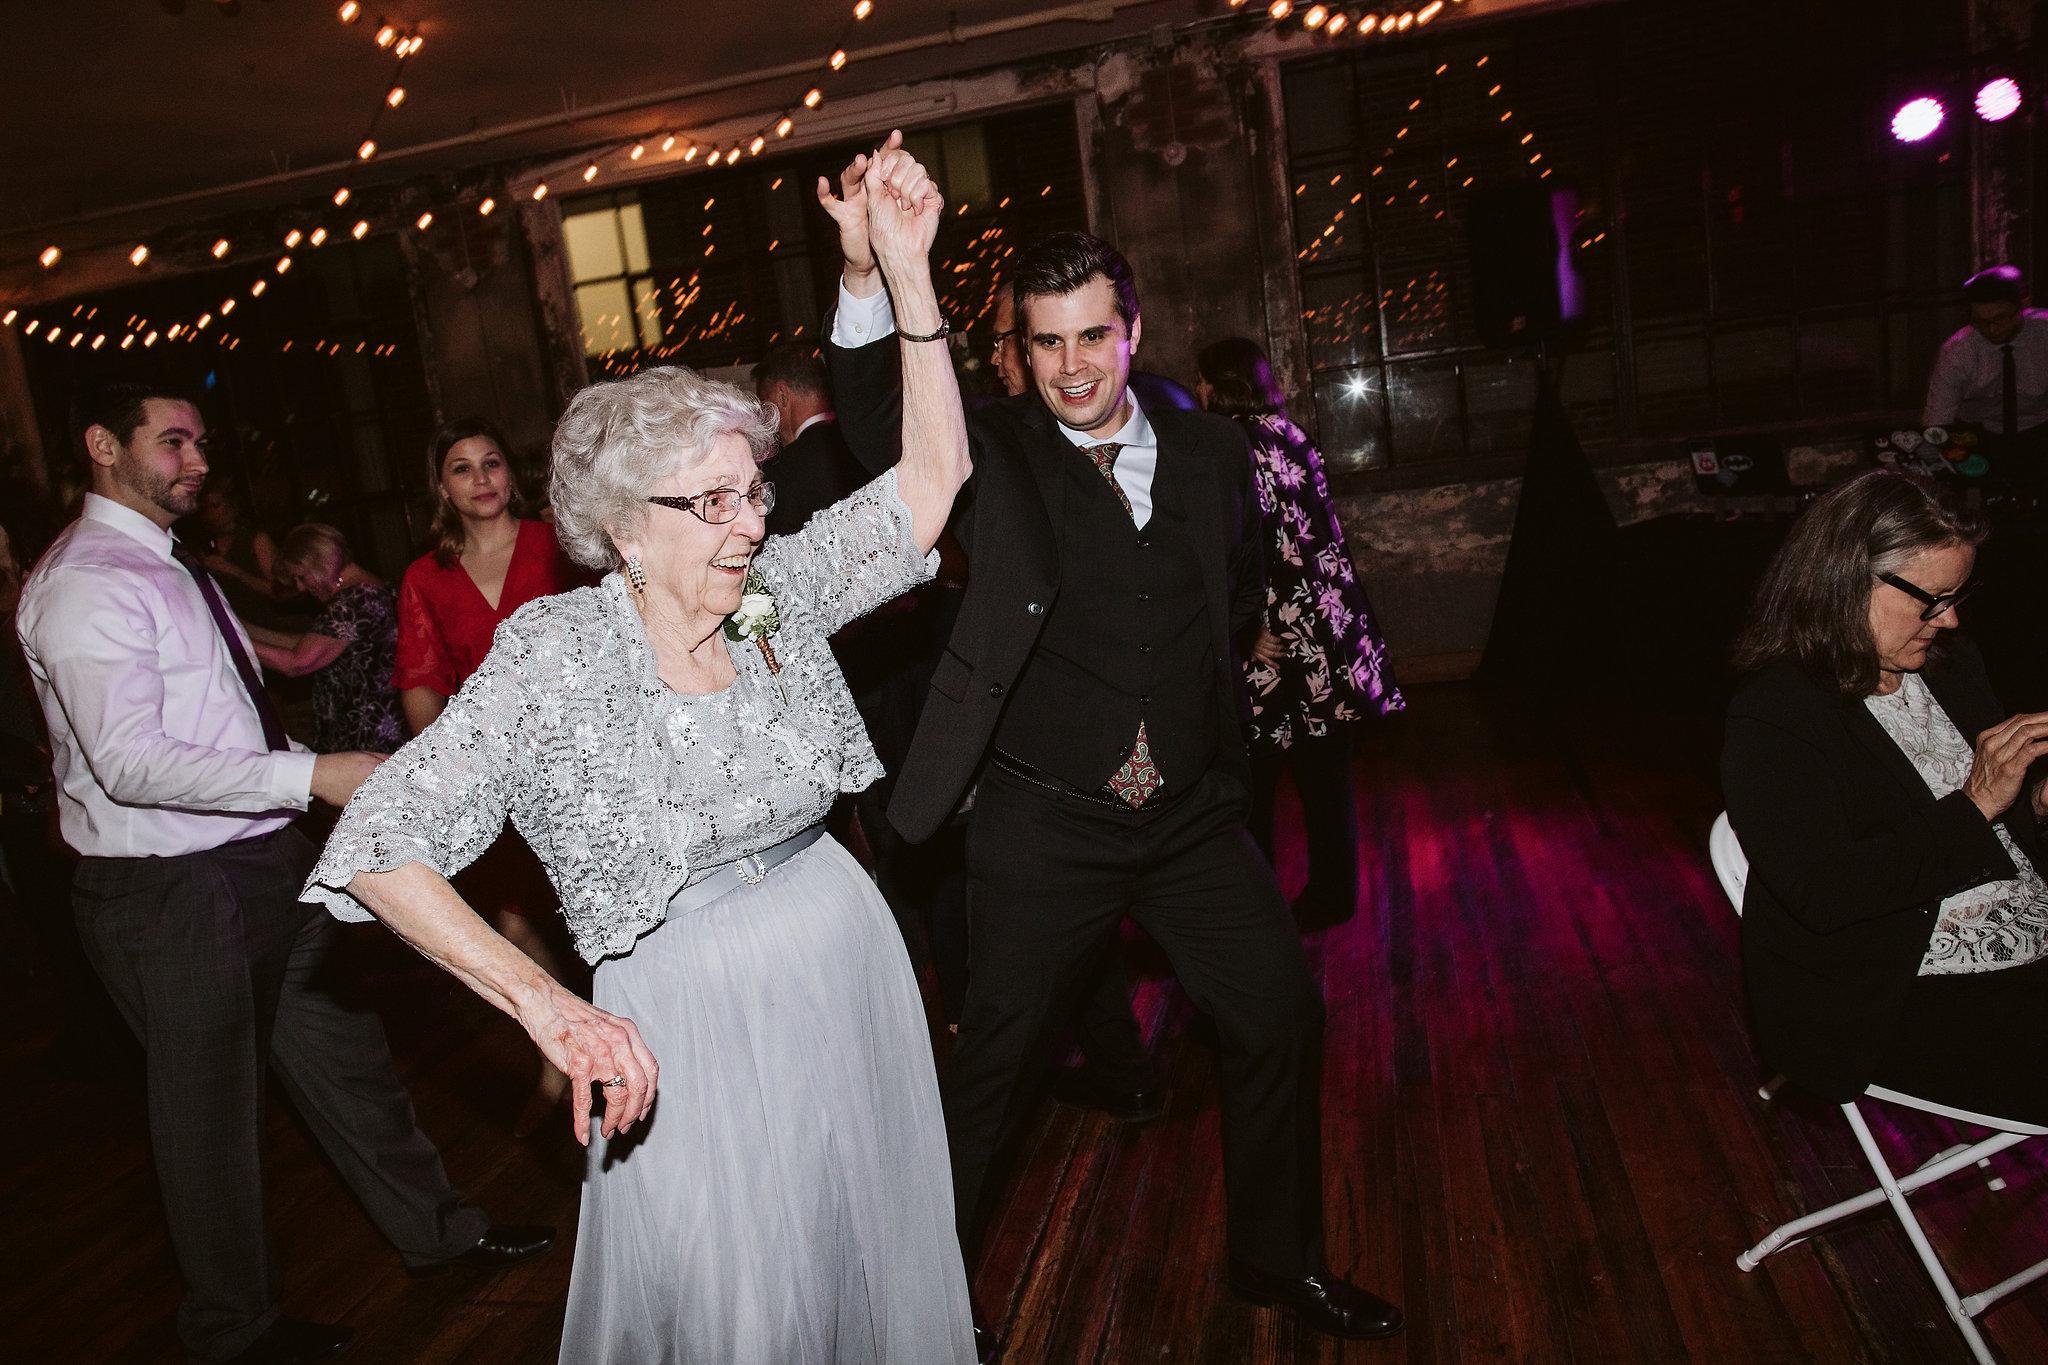 The Bride and The Bauer Wedding_Cinder Block Brewery Wedding_Kindling Wedding Photography_15.JPG